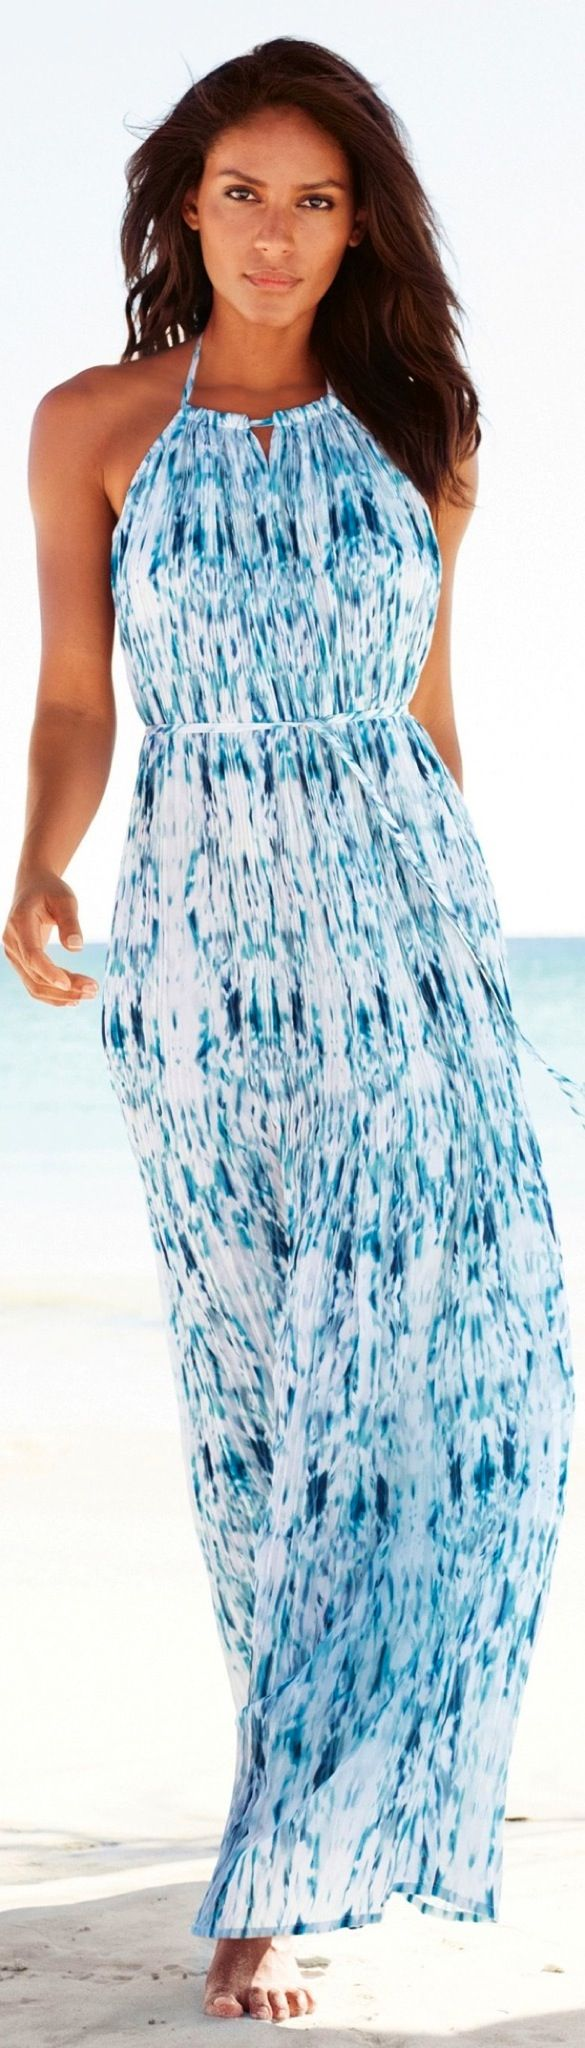 25  best ideas about Beach maxi dresses on Pinterest | Cream cut ...